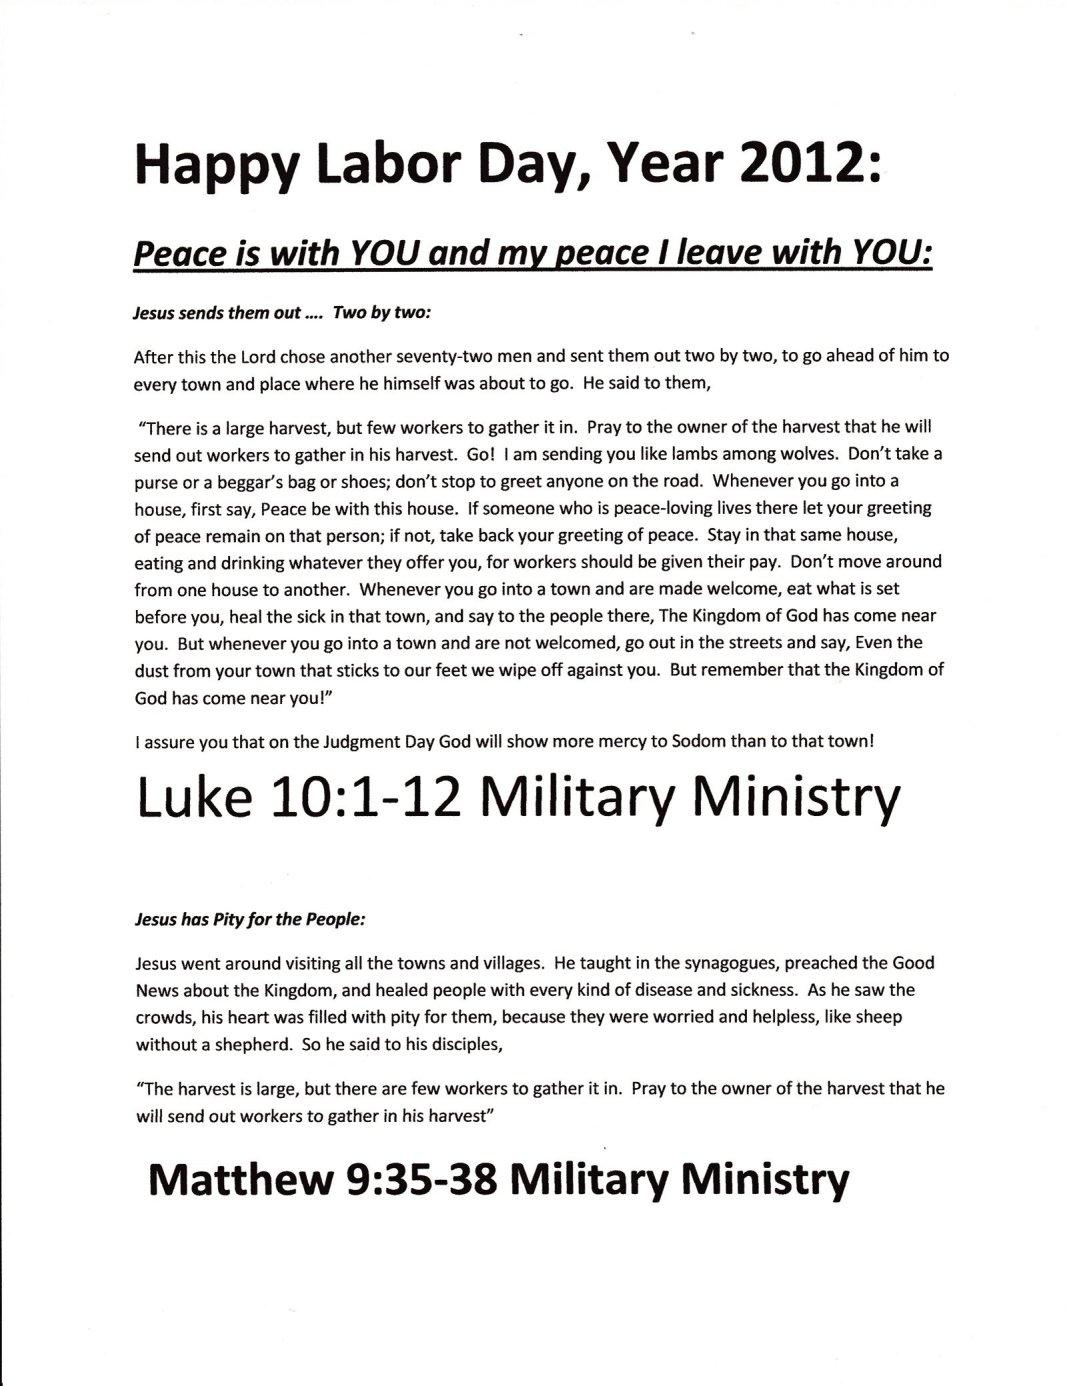 Happy Labor Day, Year 2012